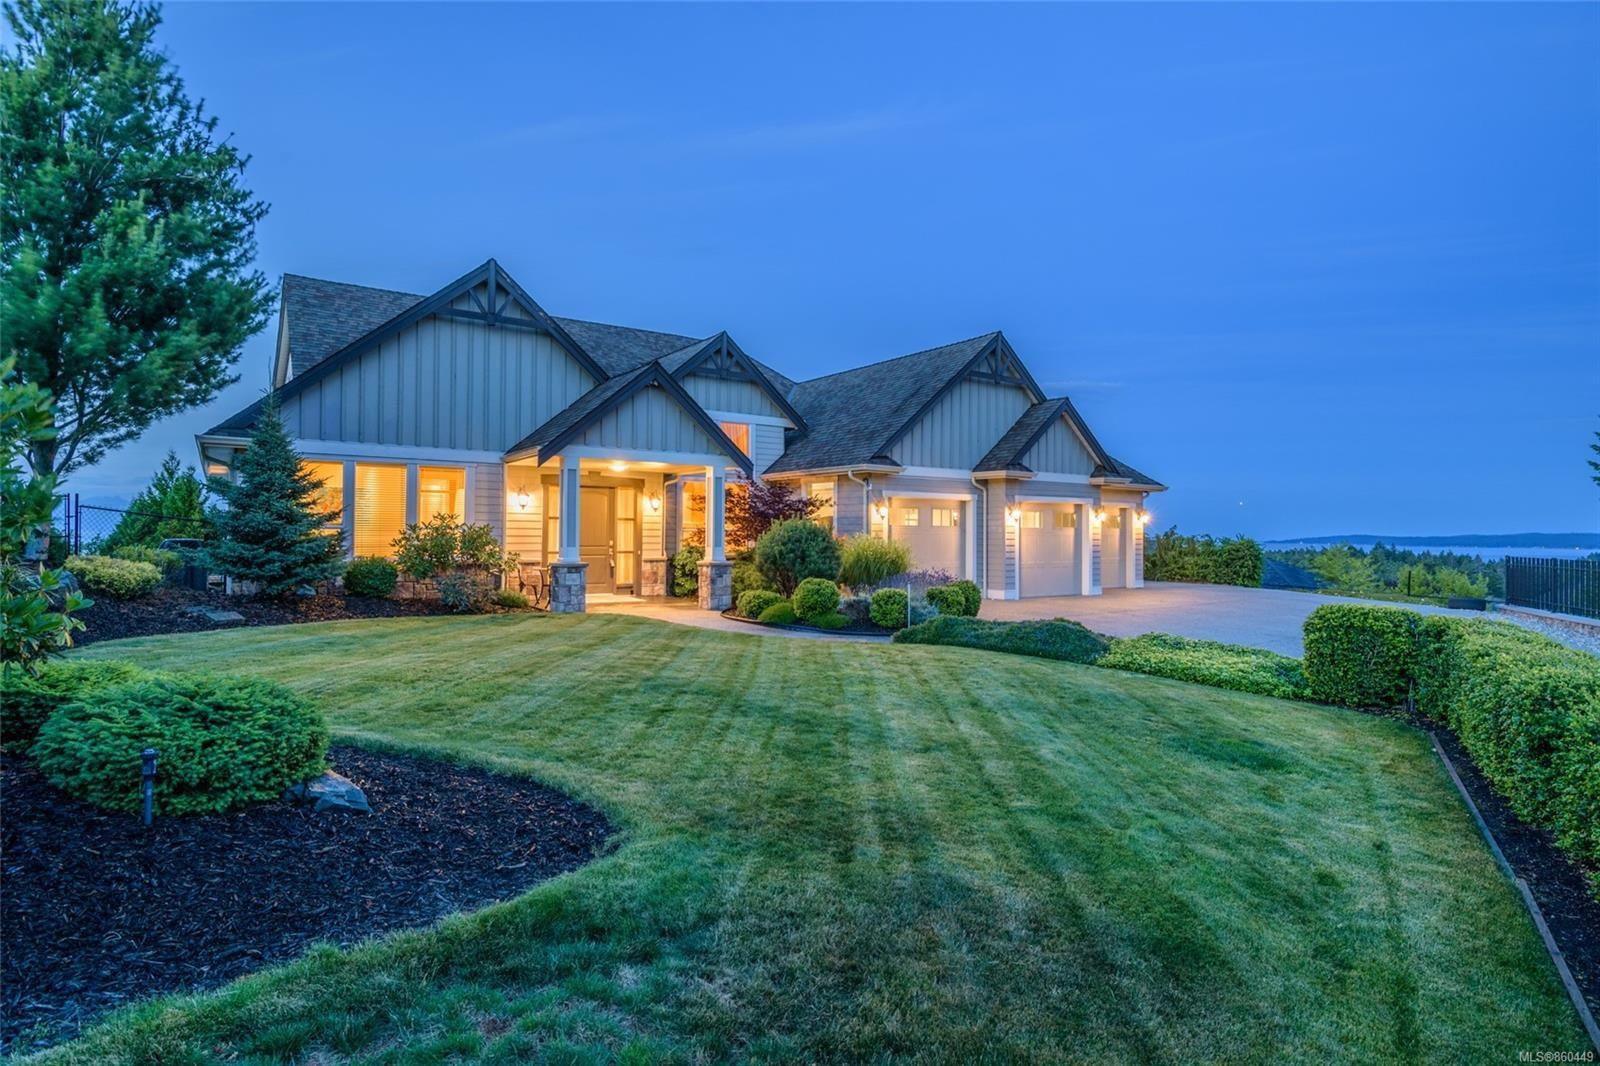 Main Photo: 5019 Hinrich View in : Na North Nanaimo House for sale (Nanaimo)  : MLS®# 860449